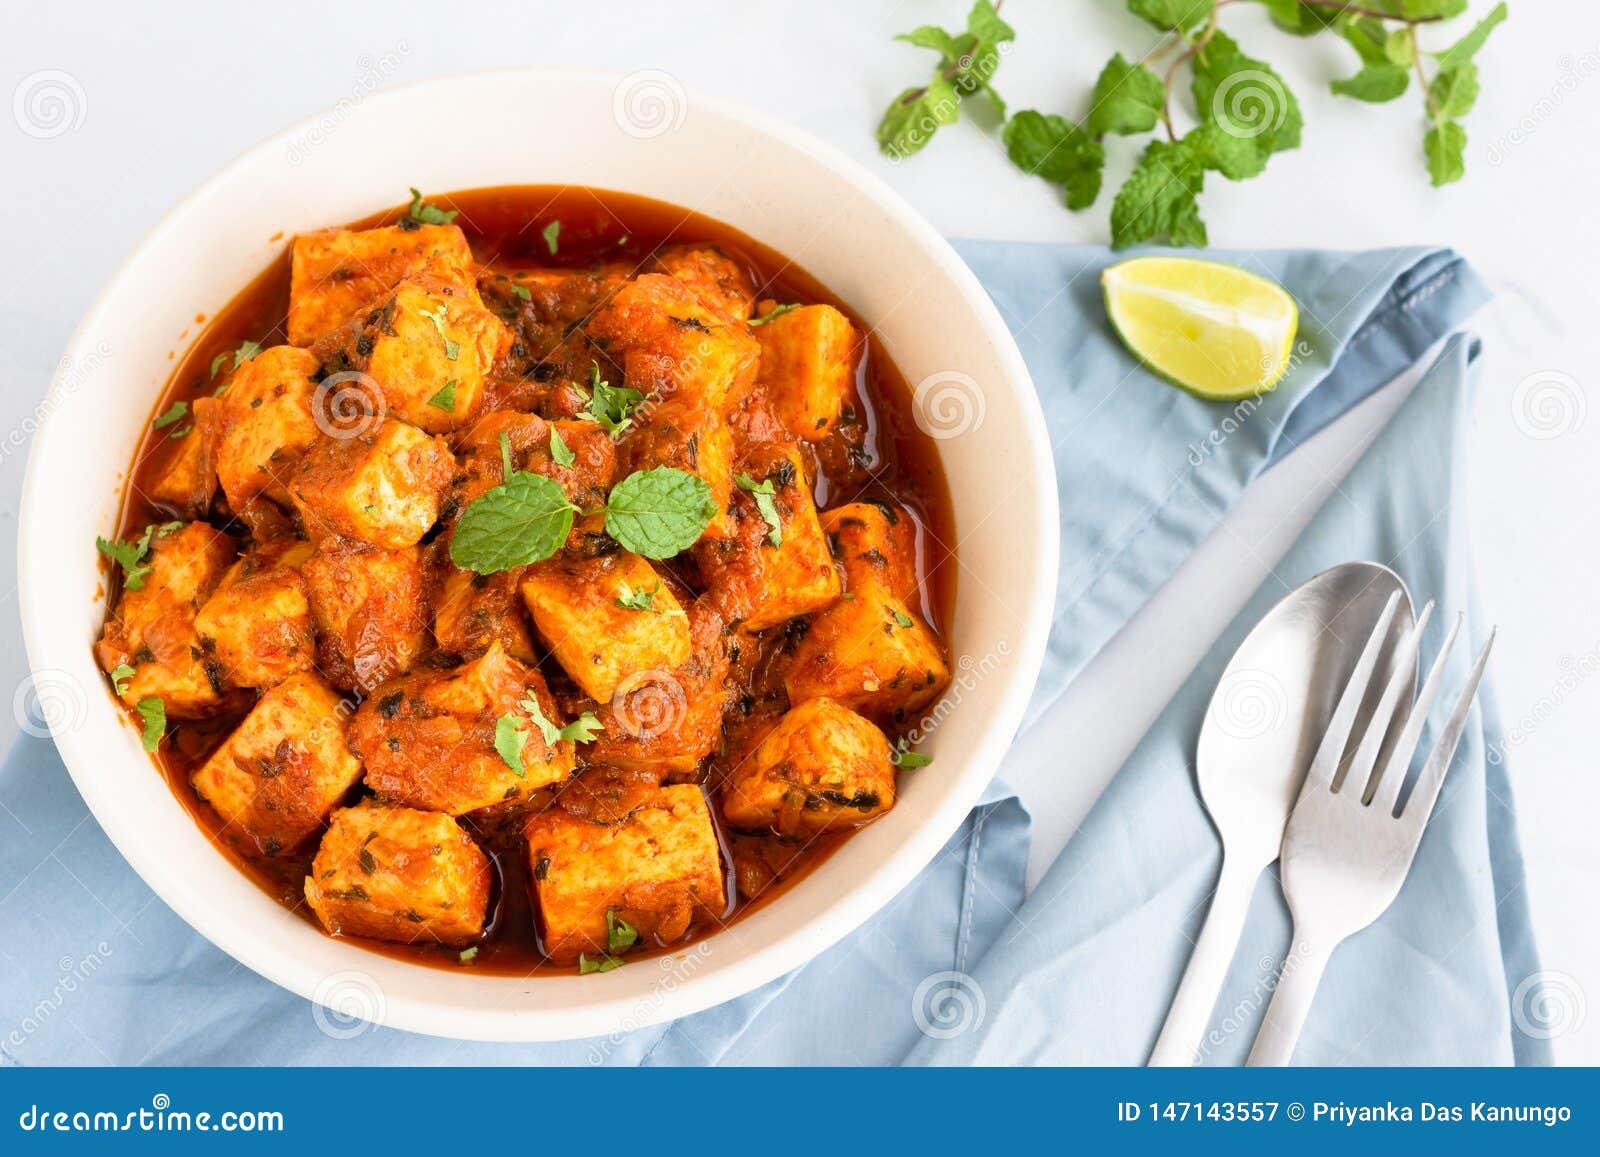 Indiano Paneer Masala, Tawa Paneer, Paneer Tikka Masala, prato indiano do caril do vegetariano, prato lateral, alimento indiano e